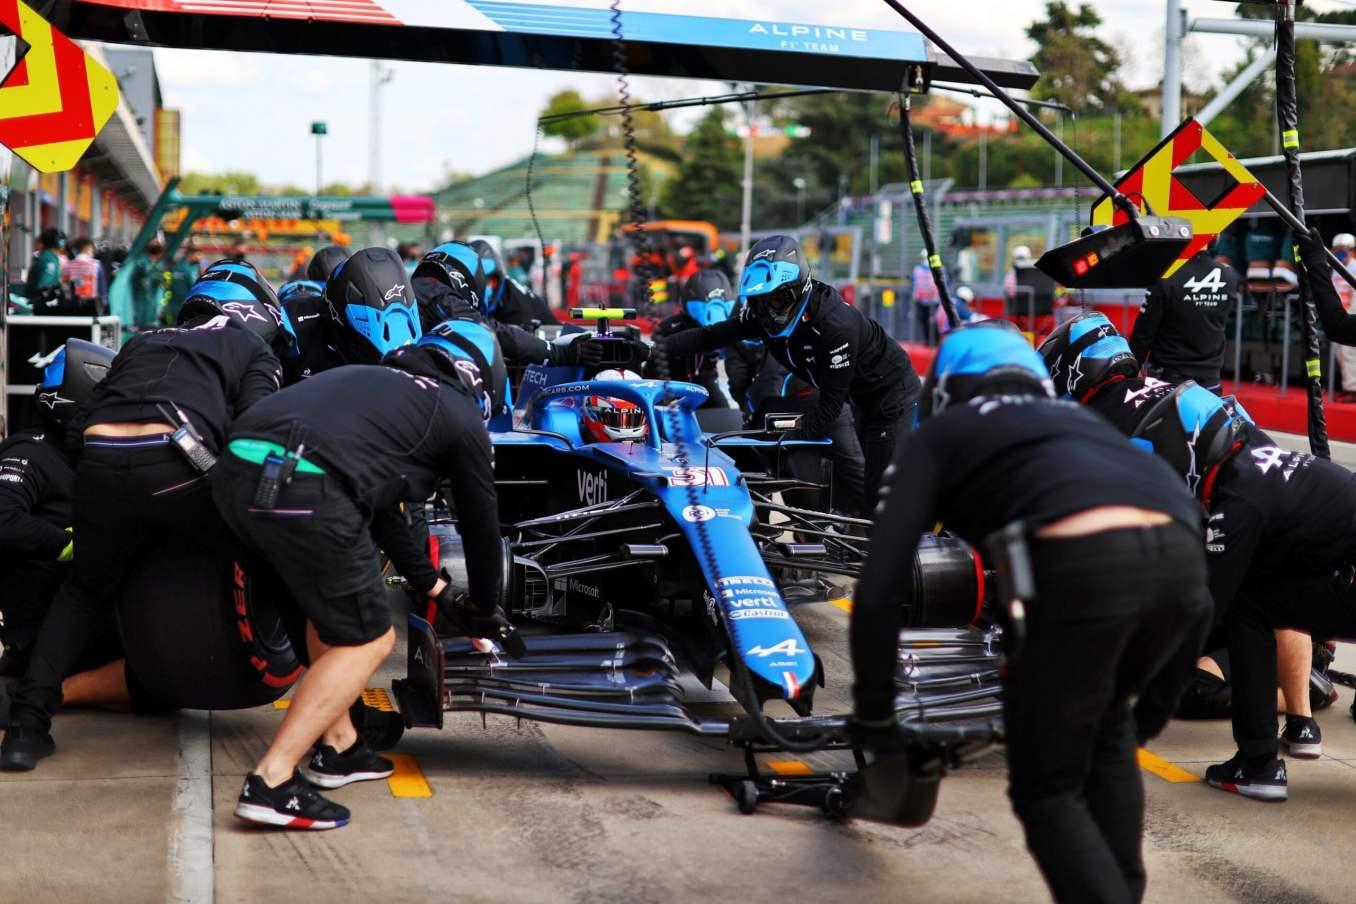 Alpine F1 Team A521 Alonso Ocon Brivio Permane Imola 2021 Test 21 scaled | Alpine F1 Team en milieu de peloton aux essais à Imola